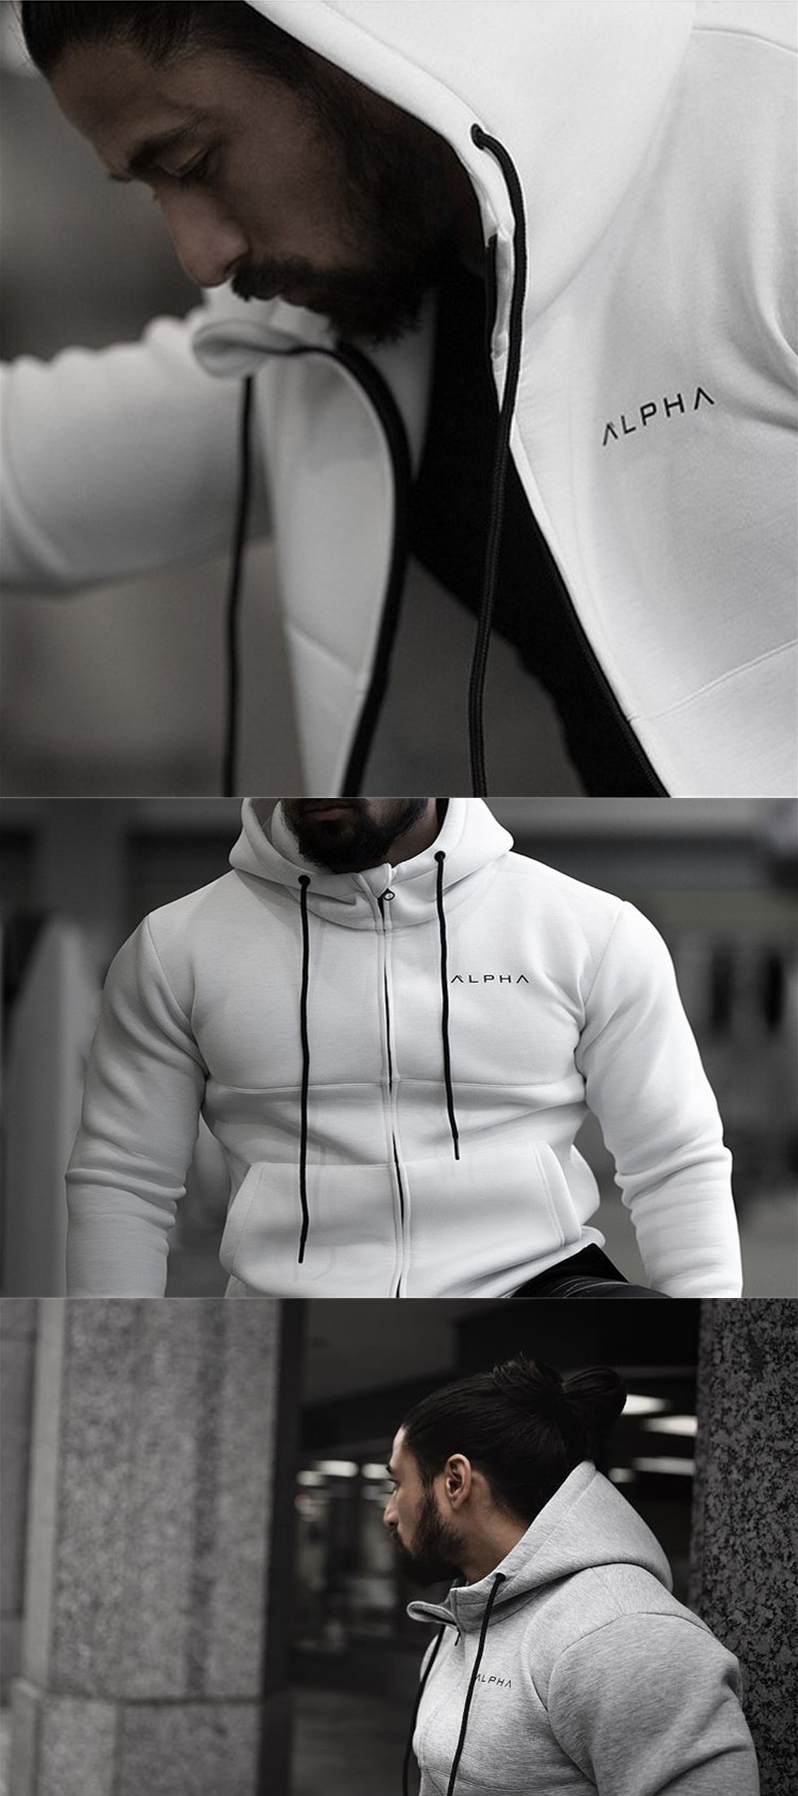 Autumn Newest Fitness Men Hoodies Sweatshirt Gyms Bodybuilding Hoody Zipper Casual Sweatshirt Men S Slim Fit Mens Sweatshirts Hoodie Mens Outfits Slim Fit Men [ 1796 x 798 Pixel ]